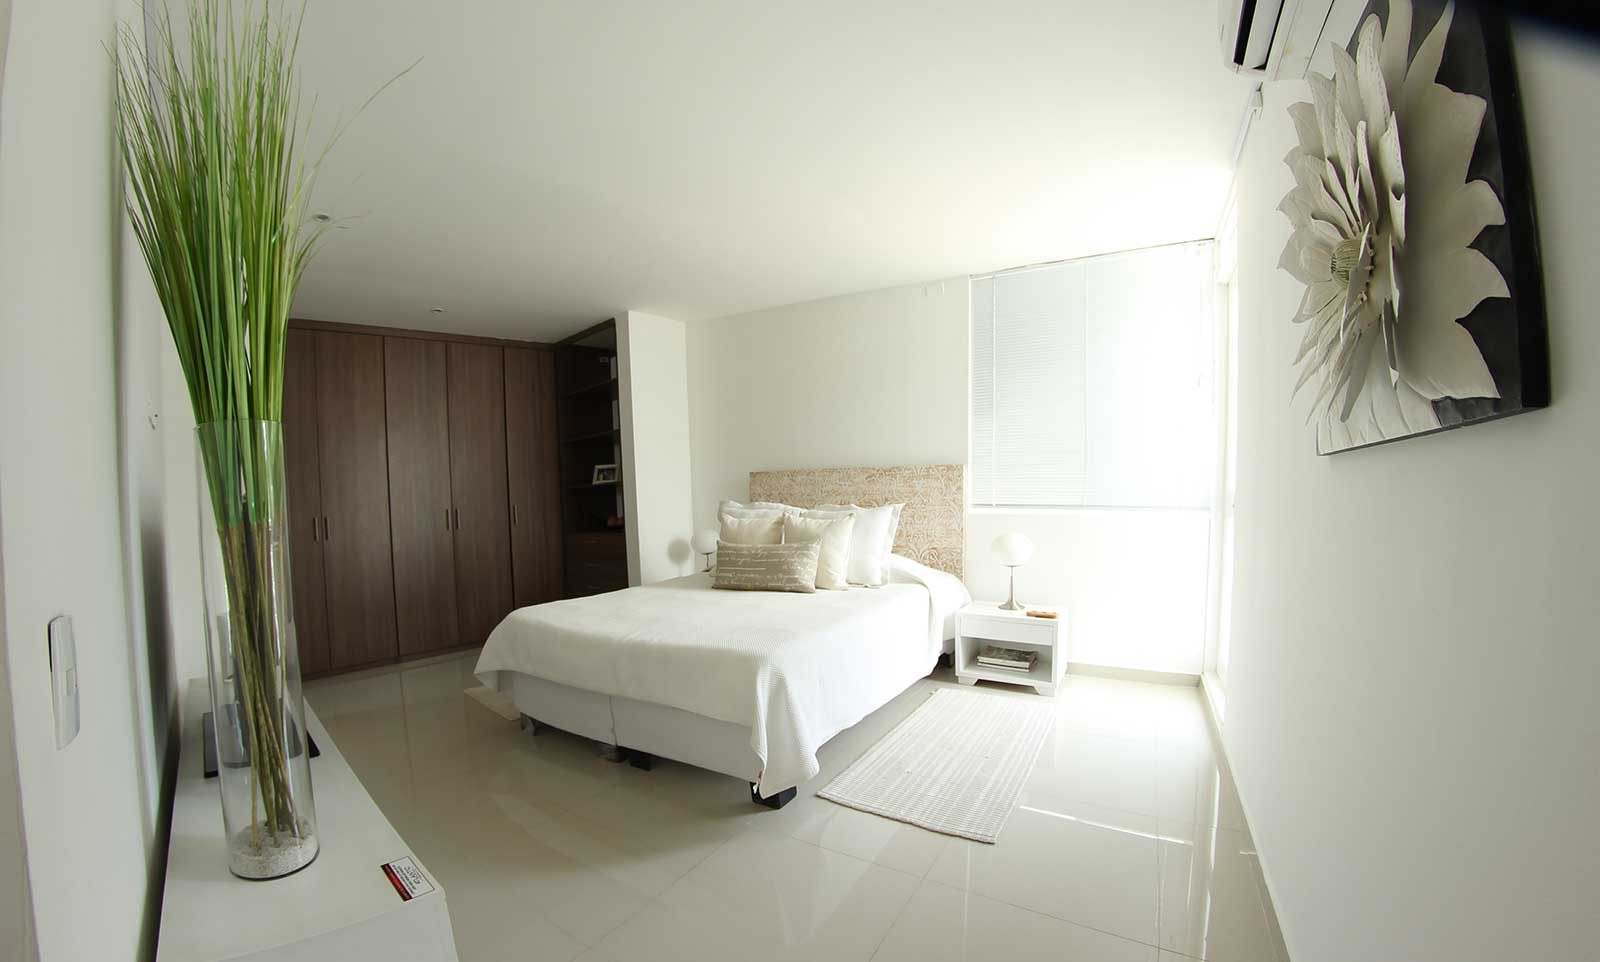 reducido-Cuarto-apartamento-modelo-atlantic